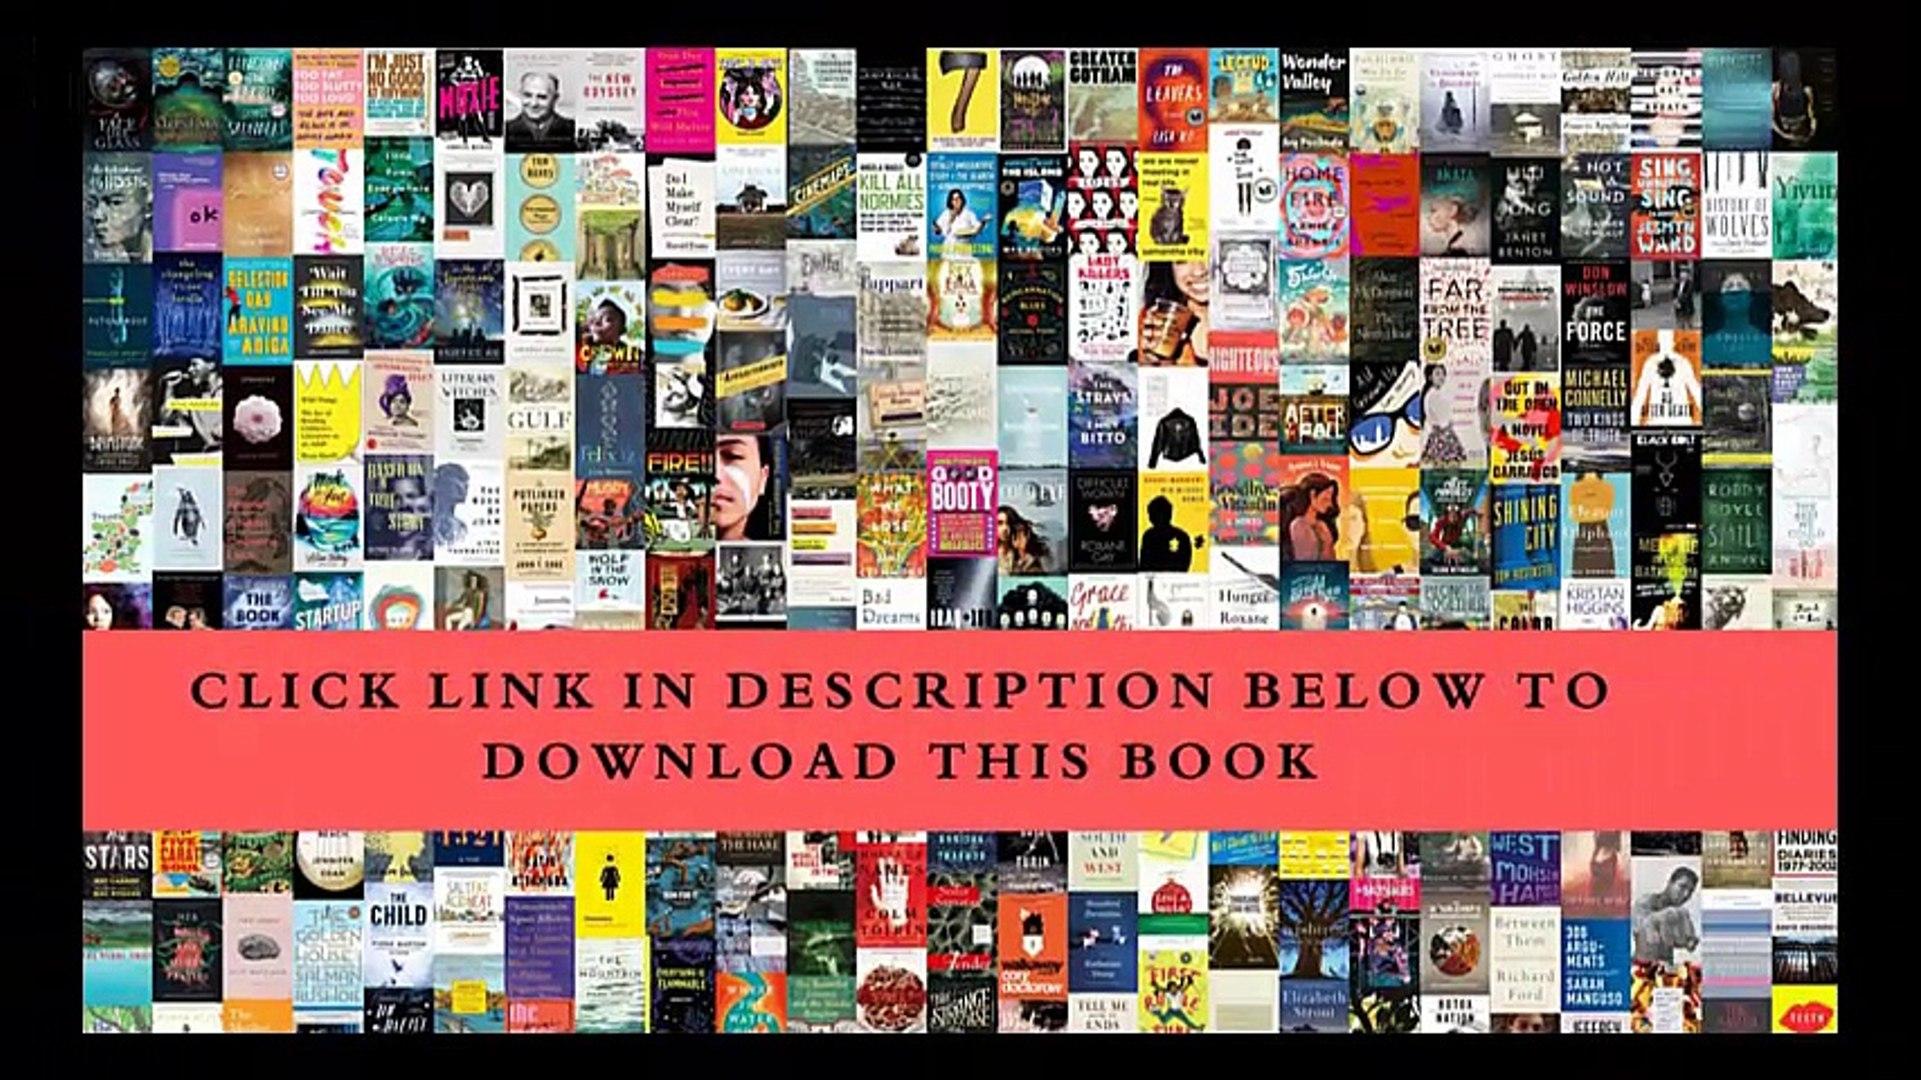 [P.D.F D.o.w.n.l.o.a.d] Amazon FBA: Complete Guide to Amazon FBA Success A-Z Best-EBook